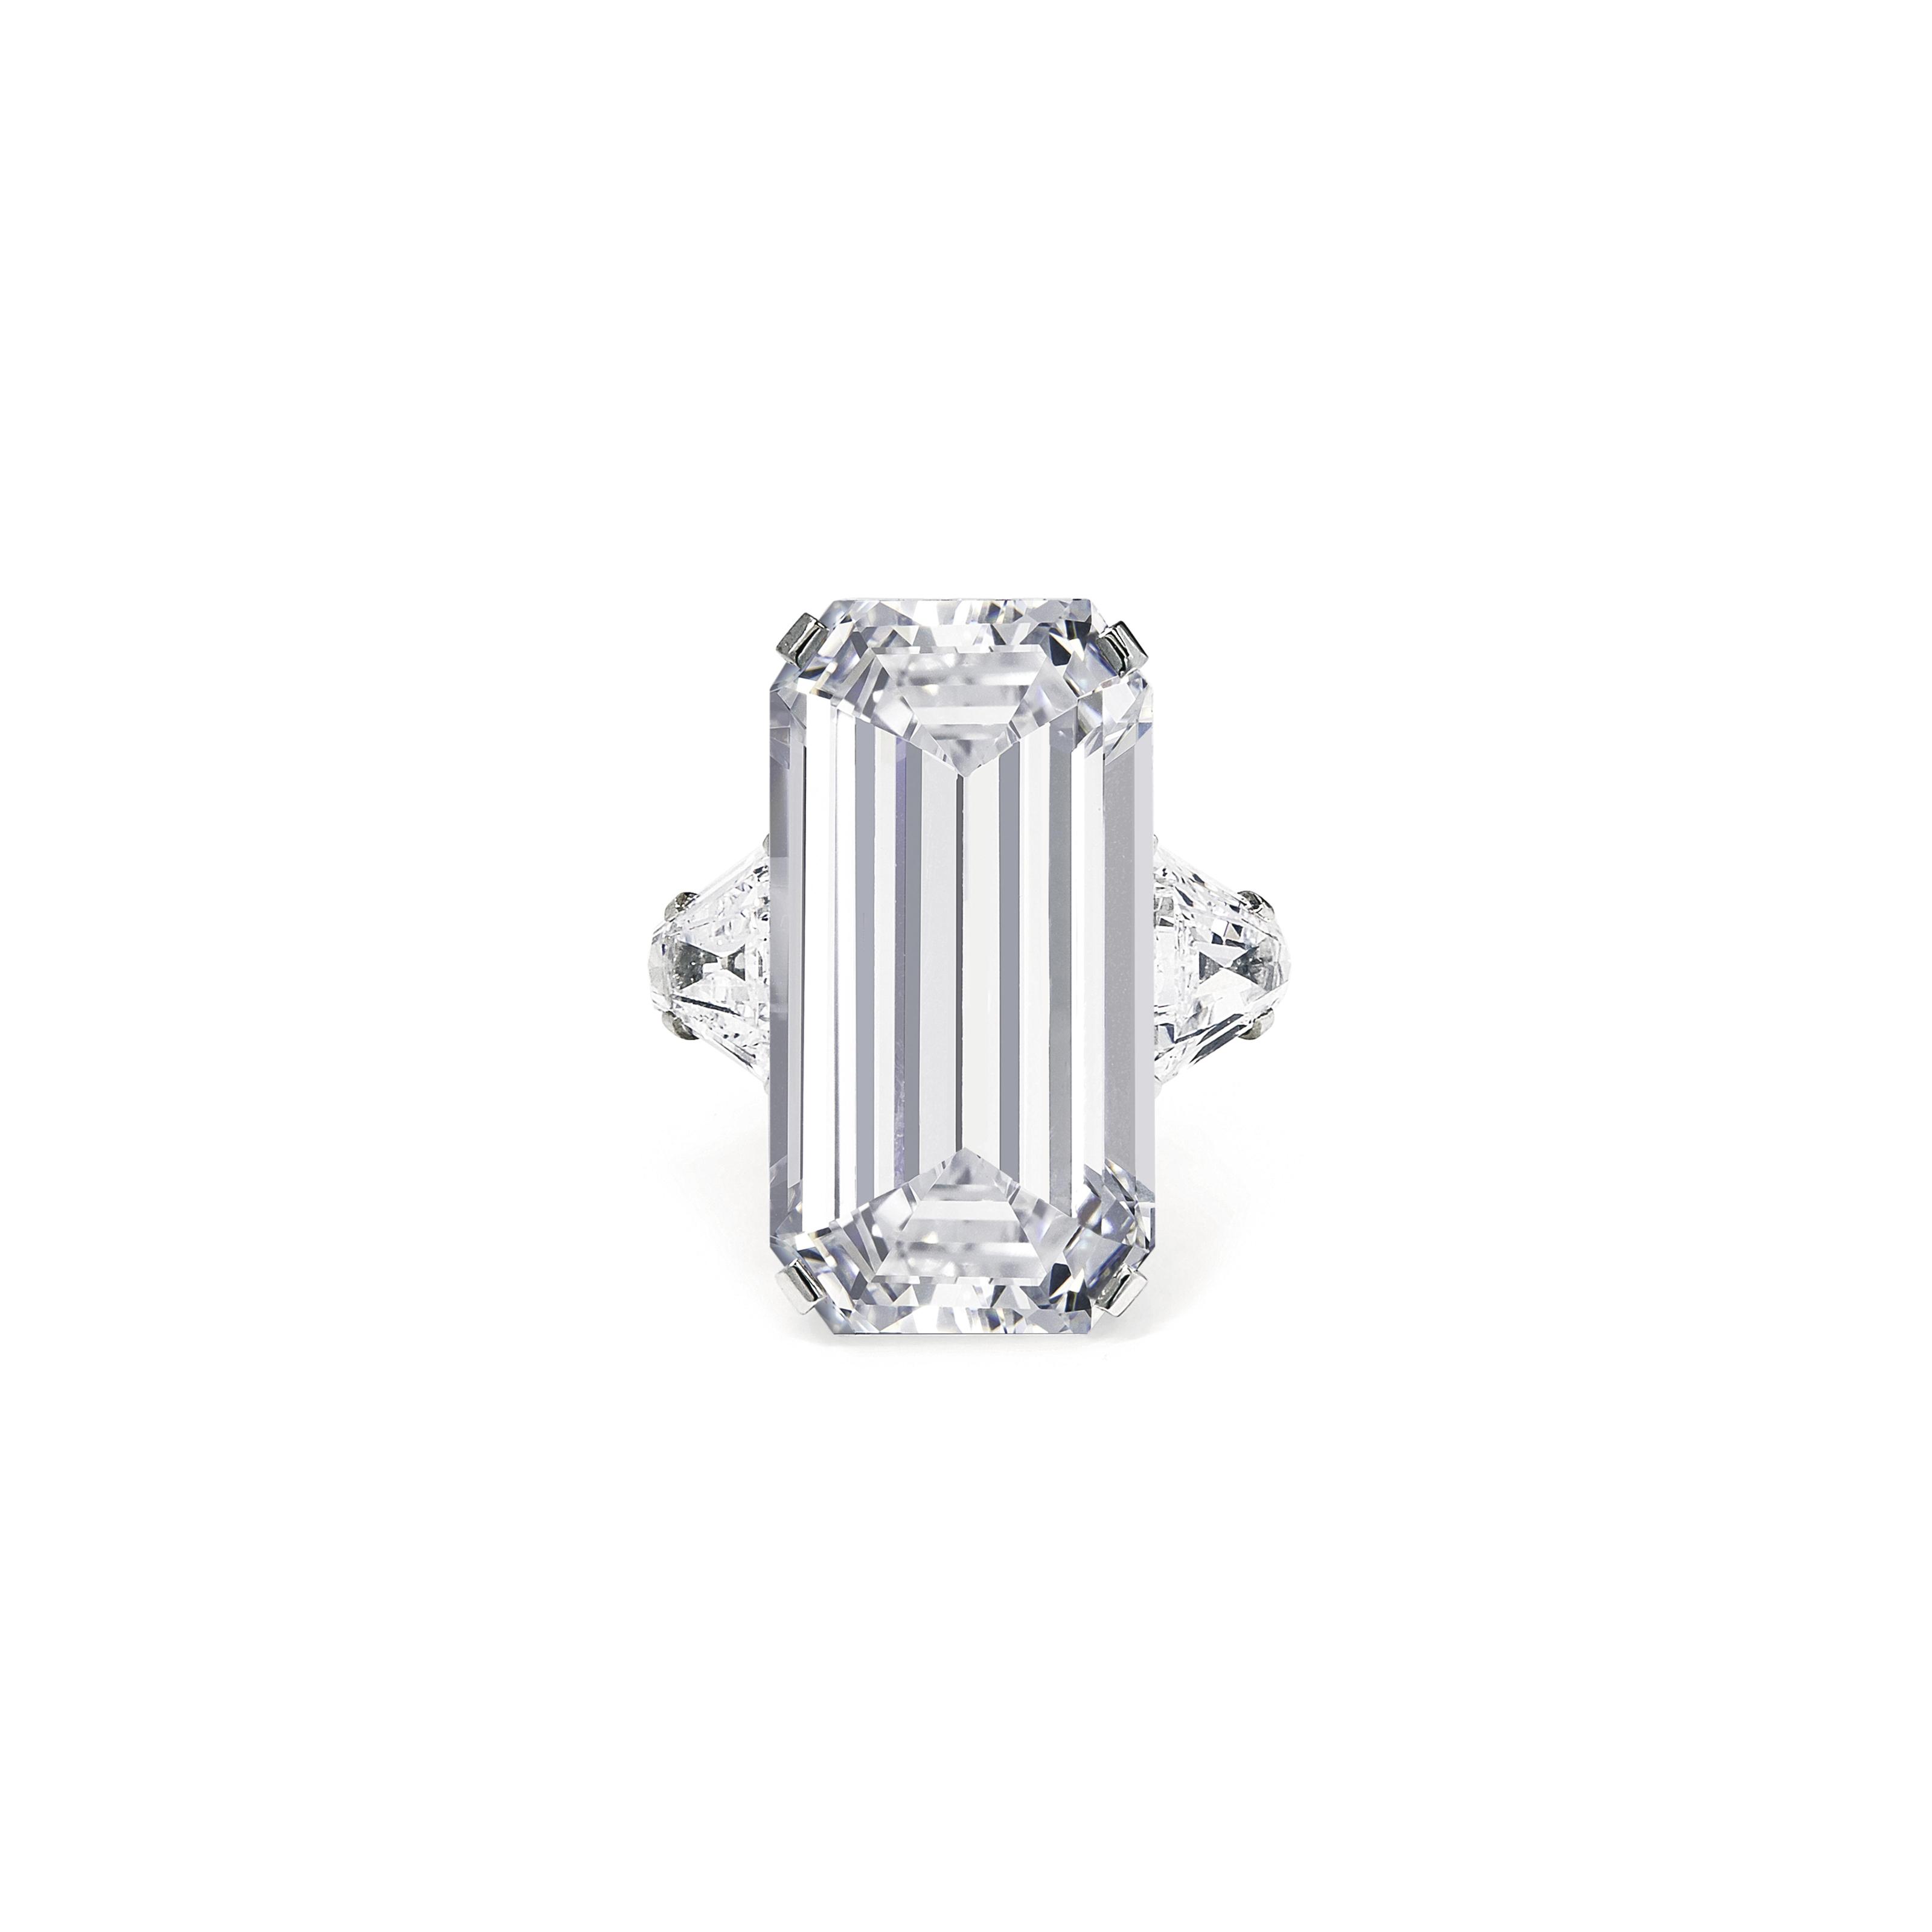 AN ELEGANT DIAMOND RING, BY BULGARI